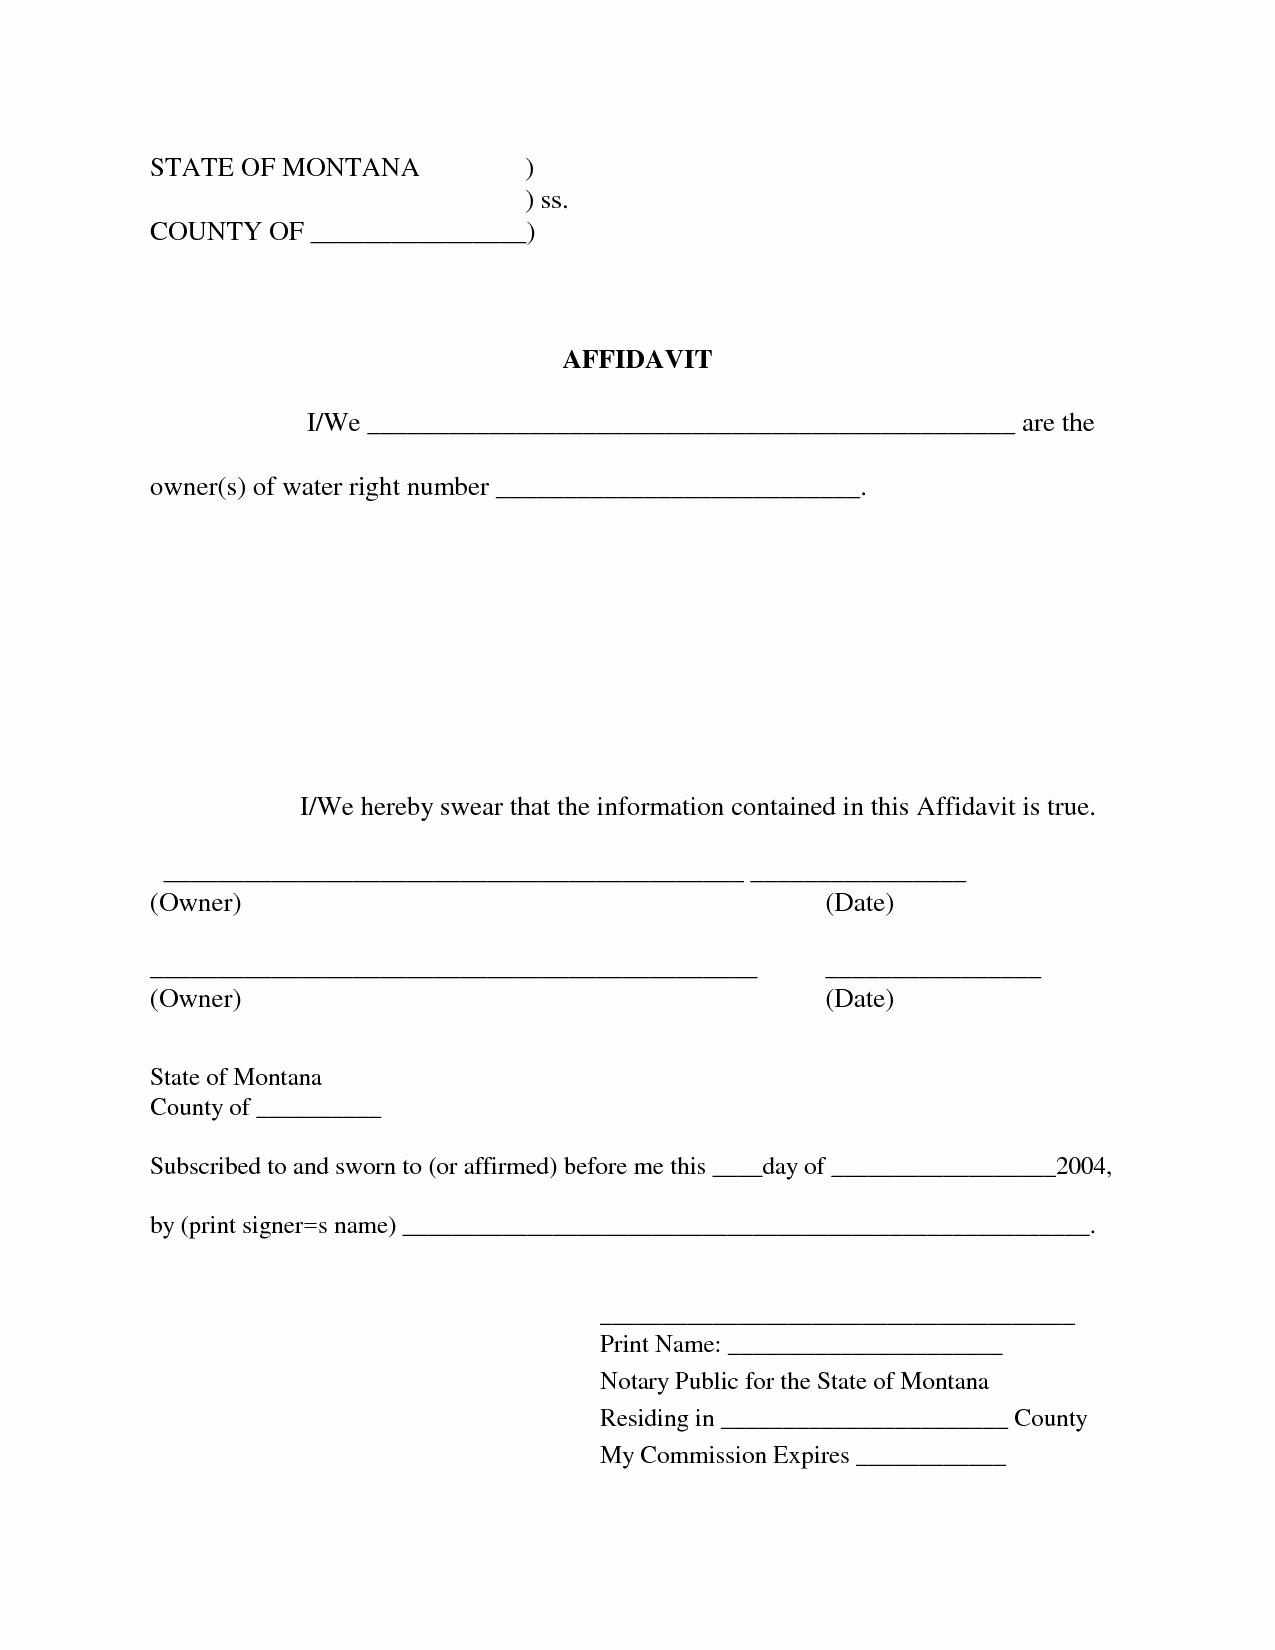 General Affidavit Template Word Elegant Free Blank Affidavit form